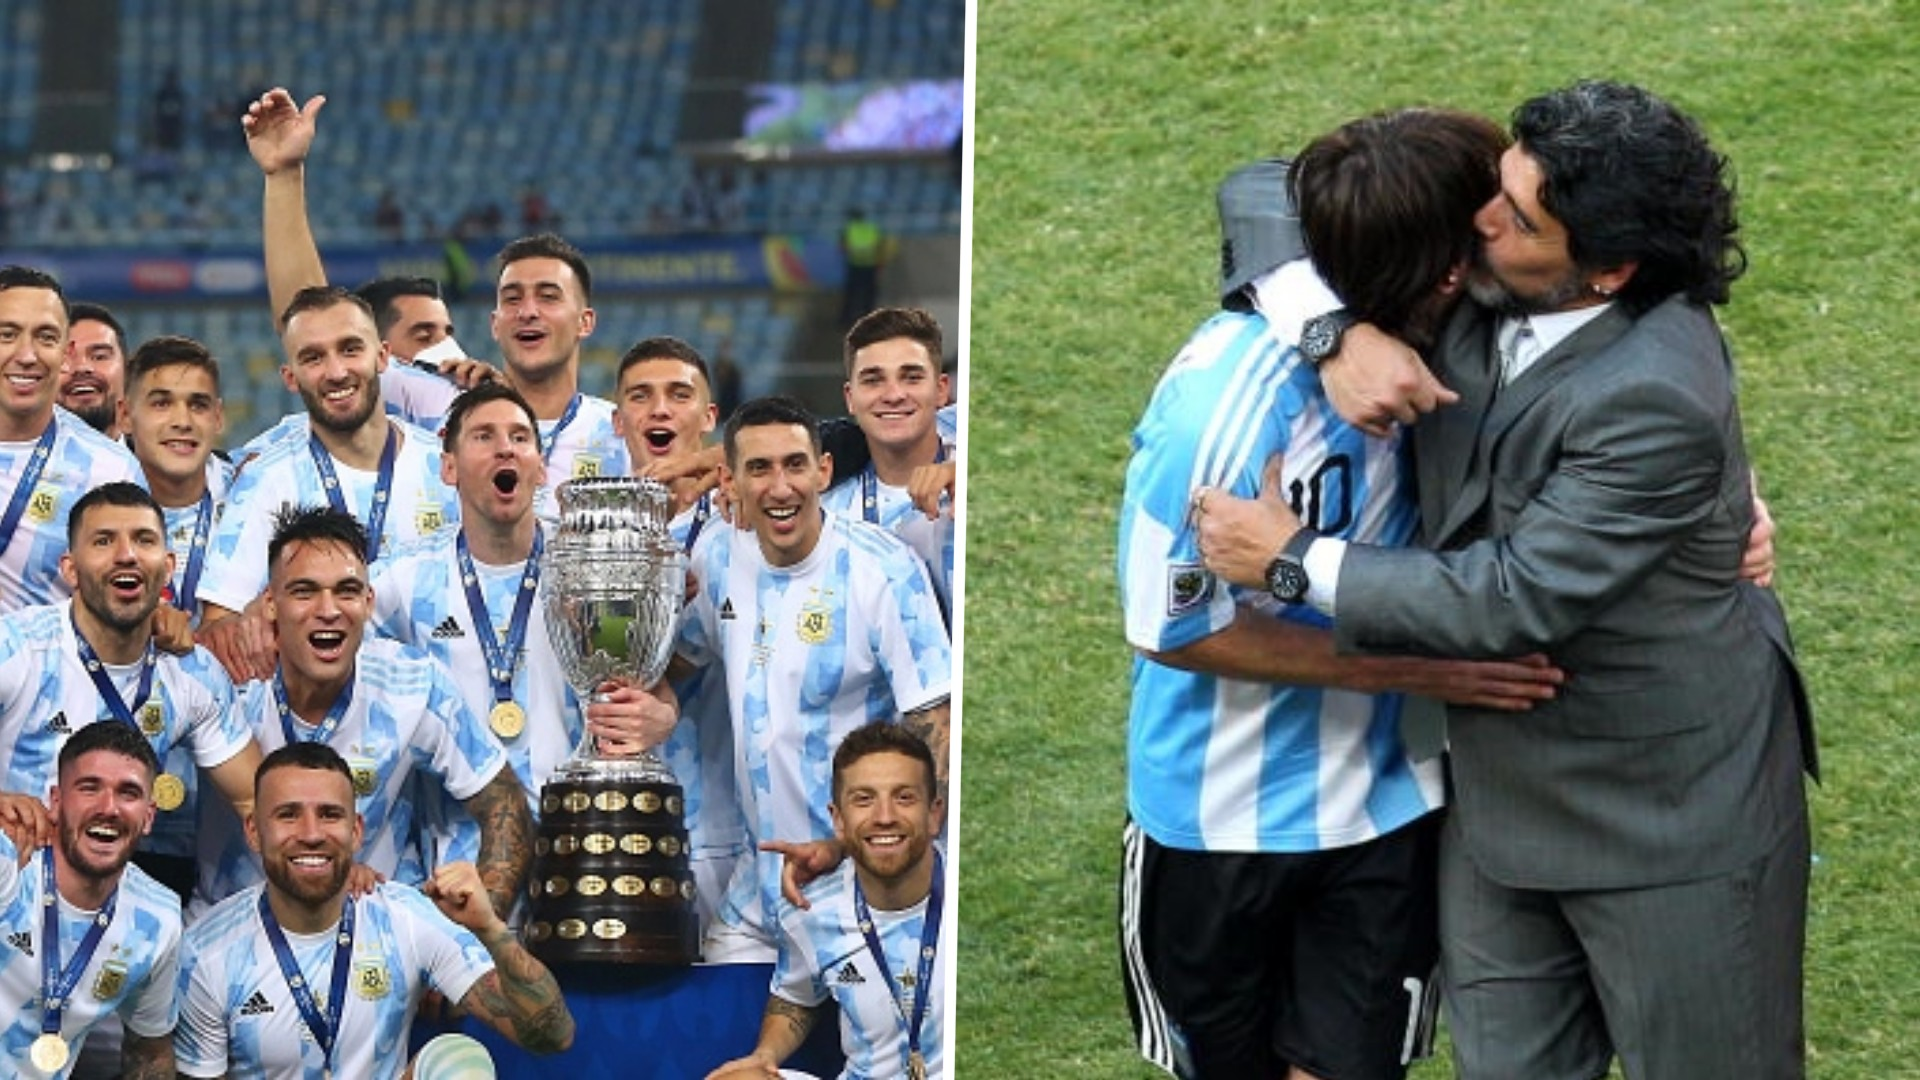 'Maradona would have cried in joy' - Argentina legend Cesar Menotti speaks on Messi's Copa America triumph